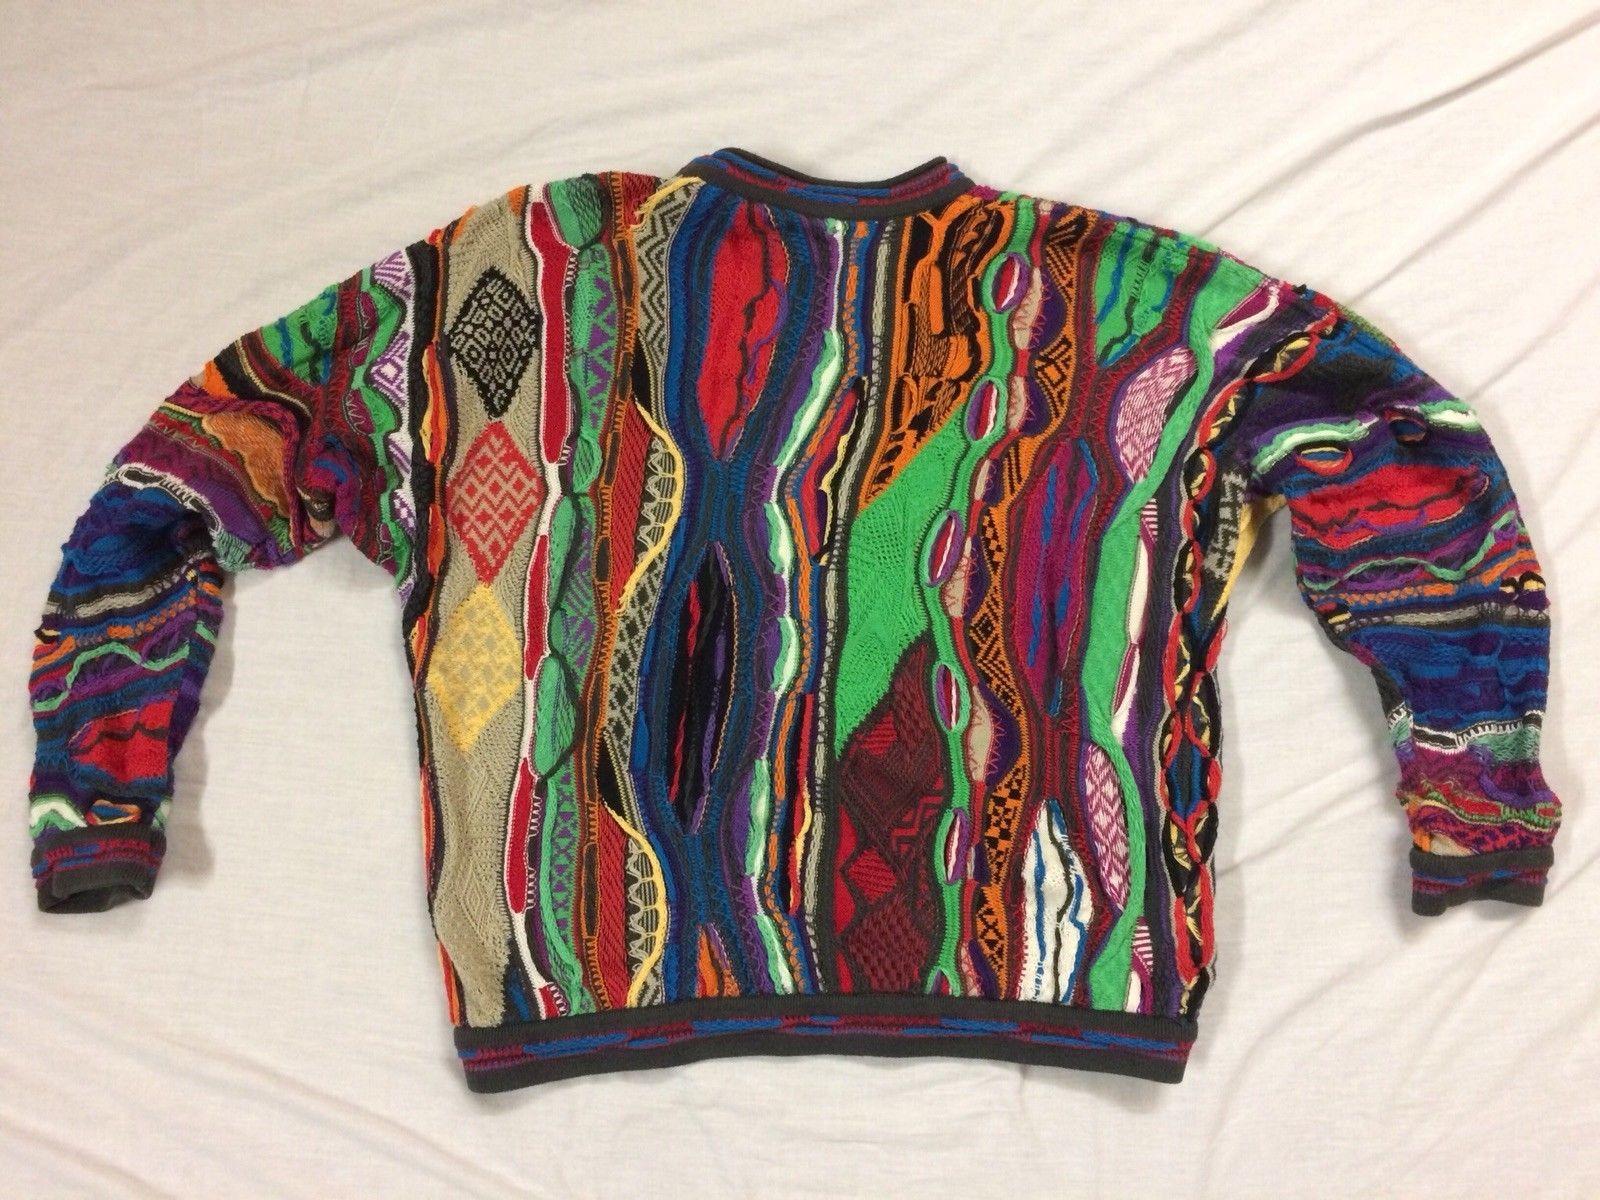 a2825bc066f RARE 90s Vtg COOGI Australia BIGGIE MCGREGOR Sweater M VAPORWAVE Neon  Nights